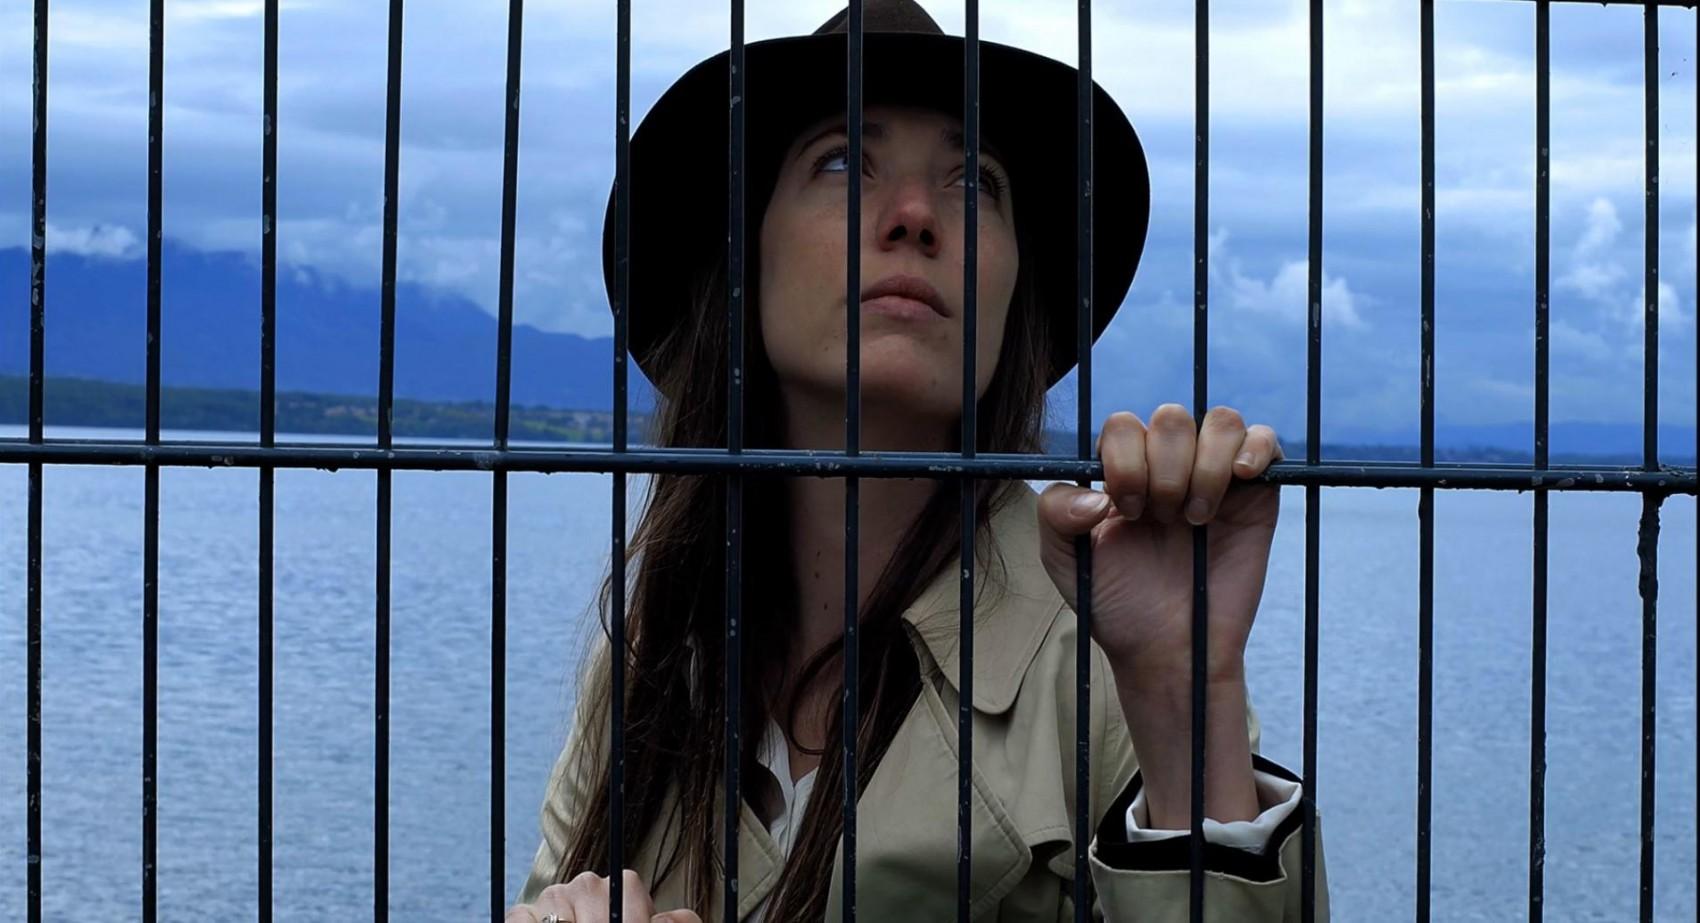 Jean-Luc-Godard-Adieu-au-langage